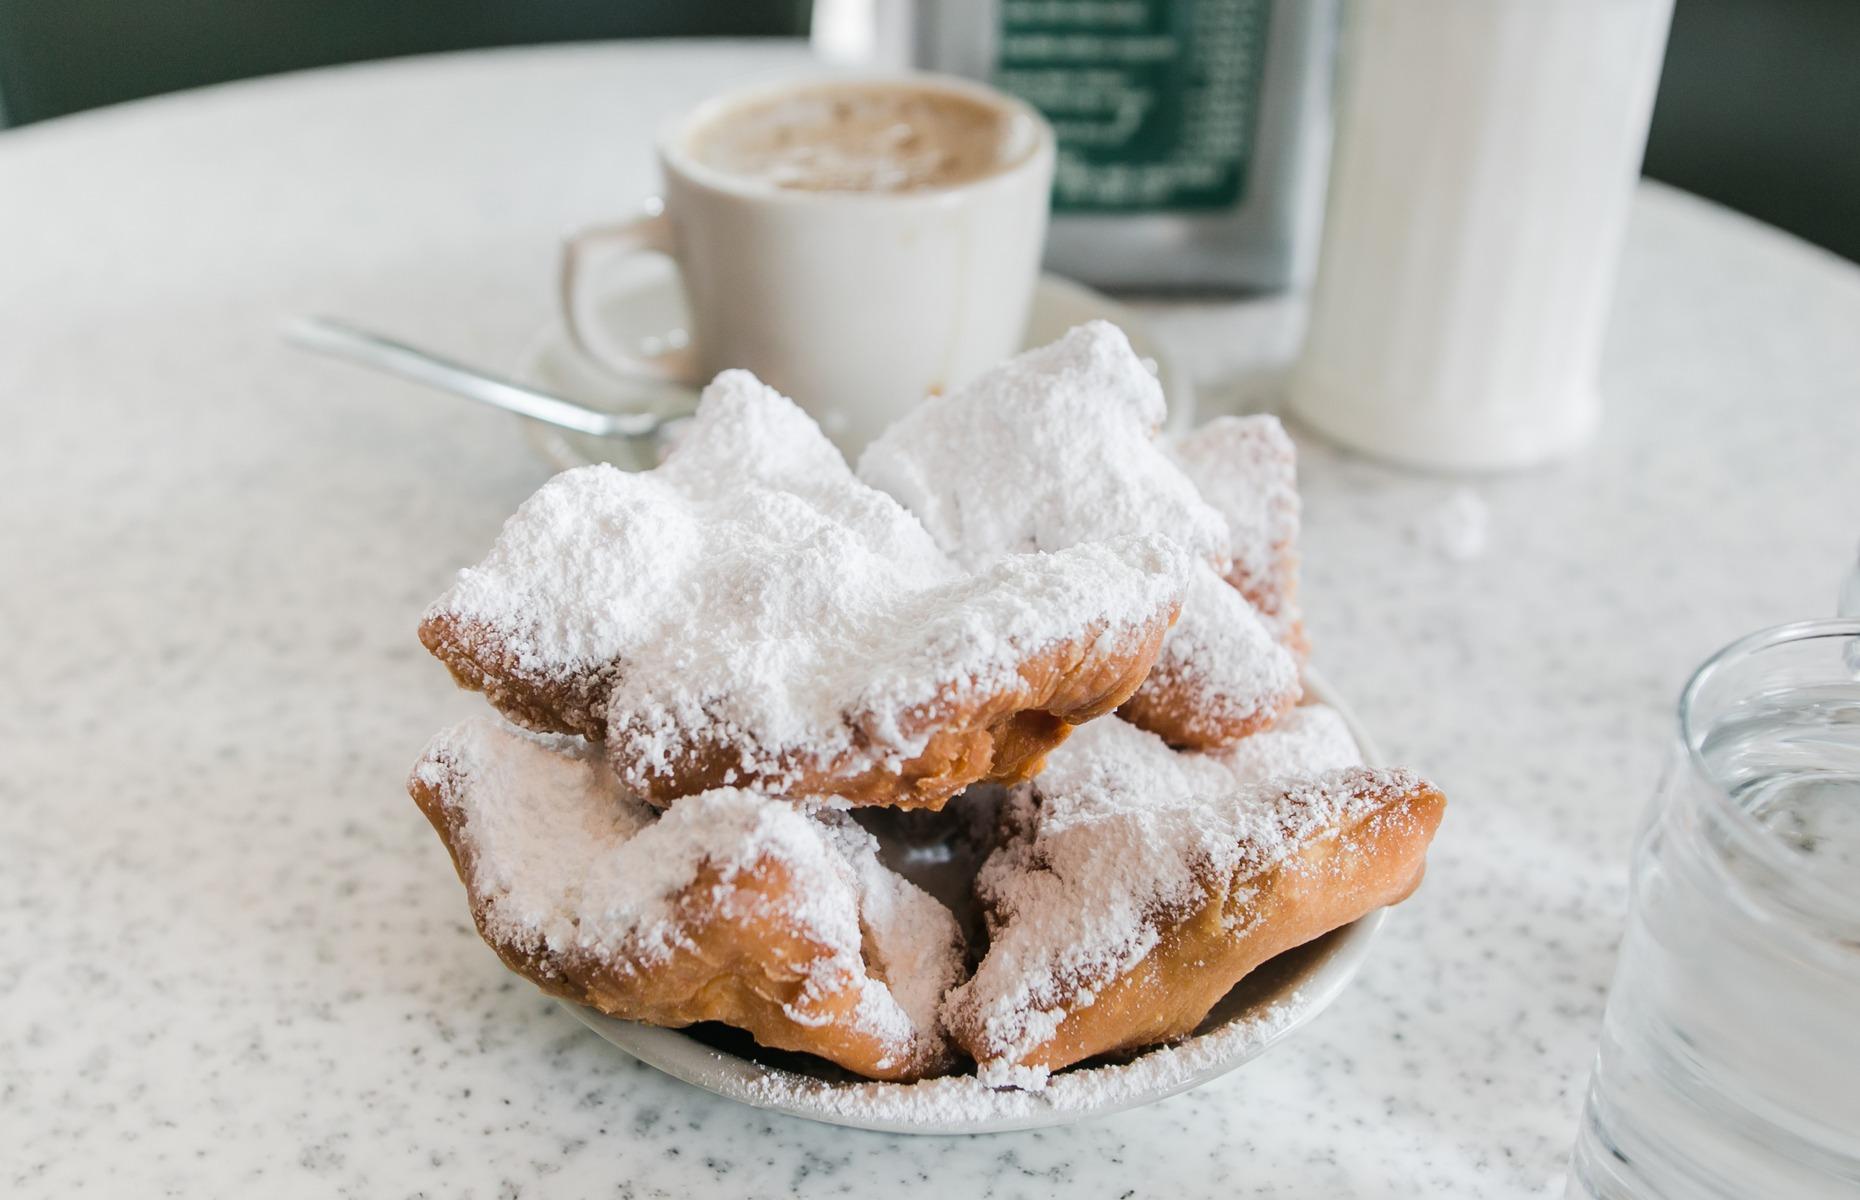 Beignets in New Orleans (image: Kelli Hayden/Shutterstock)